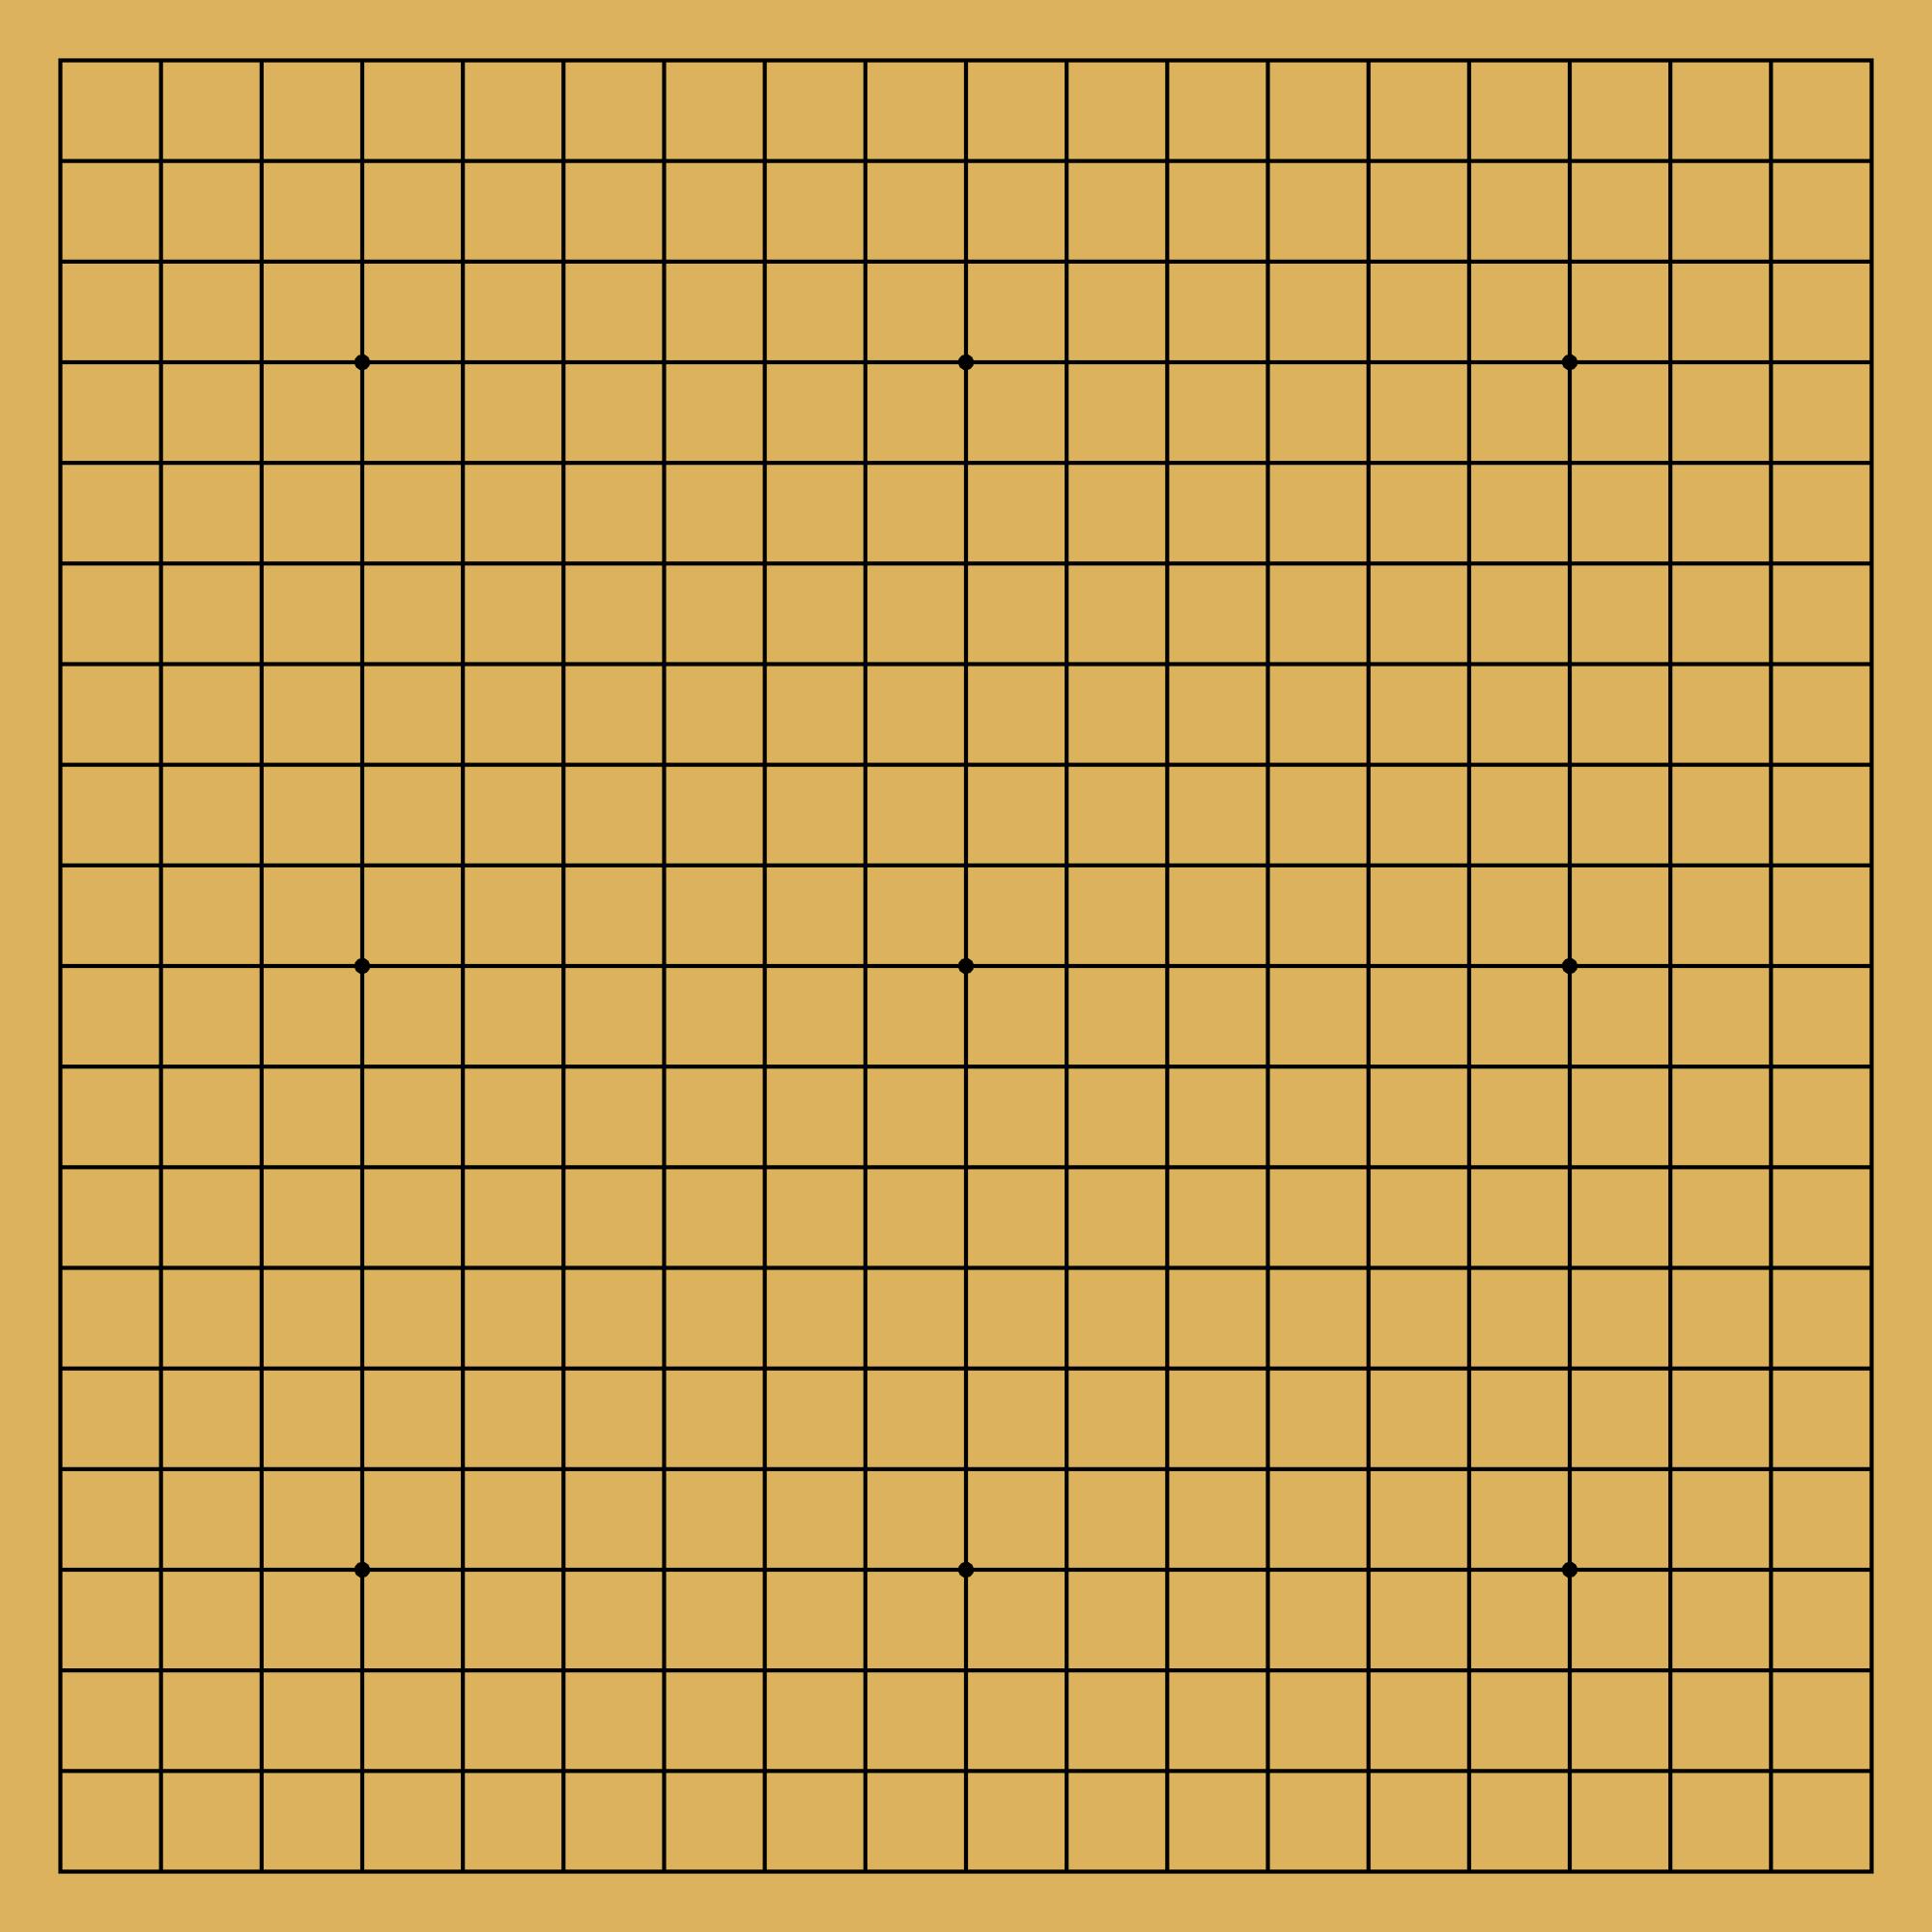 Blank_Go_board.png